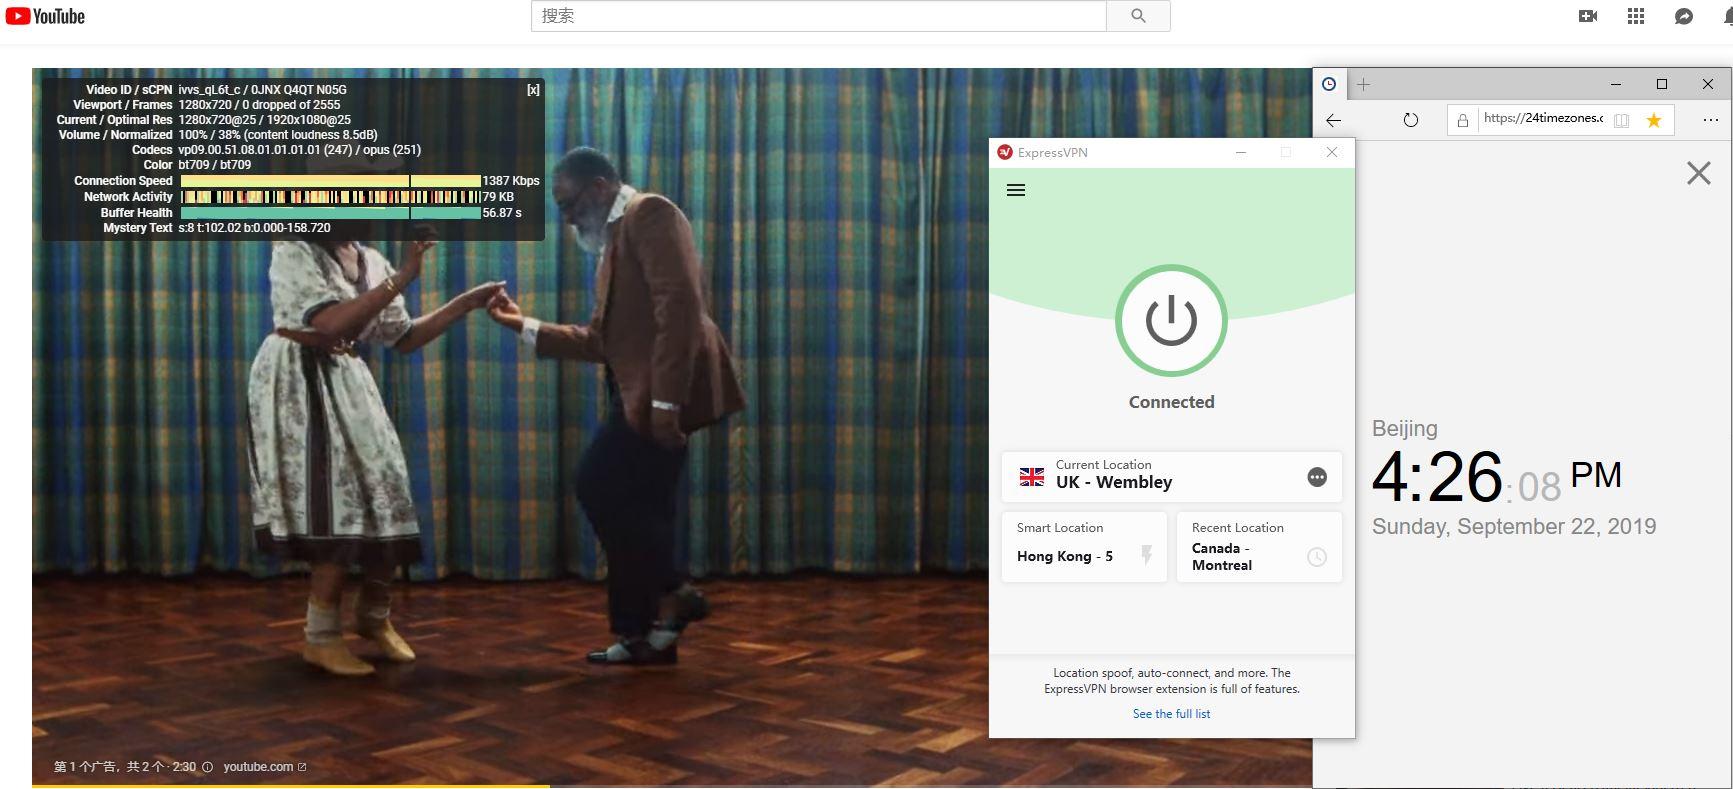 Windows ExpressVPN UK-Wembley 服务器 中国VPN翻墙 科学上网 YouTube测速-20190922